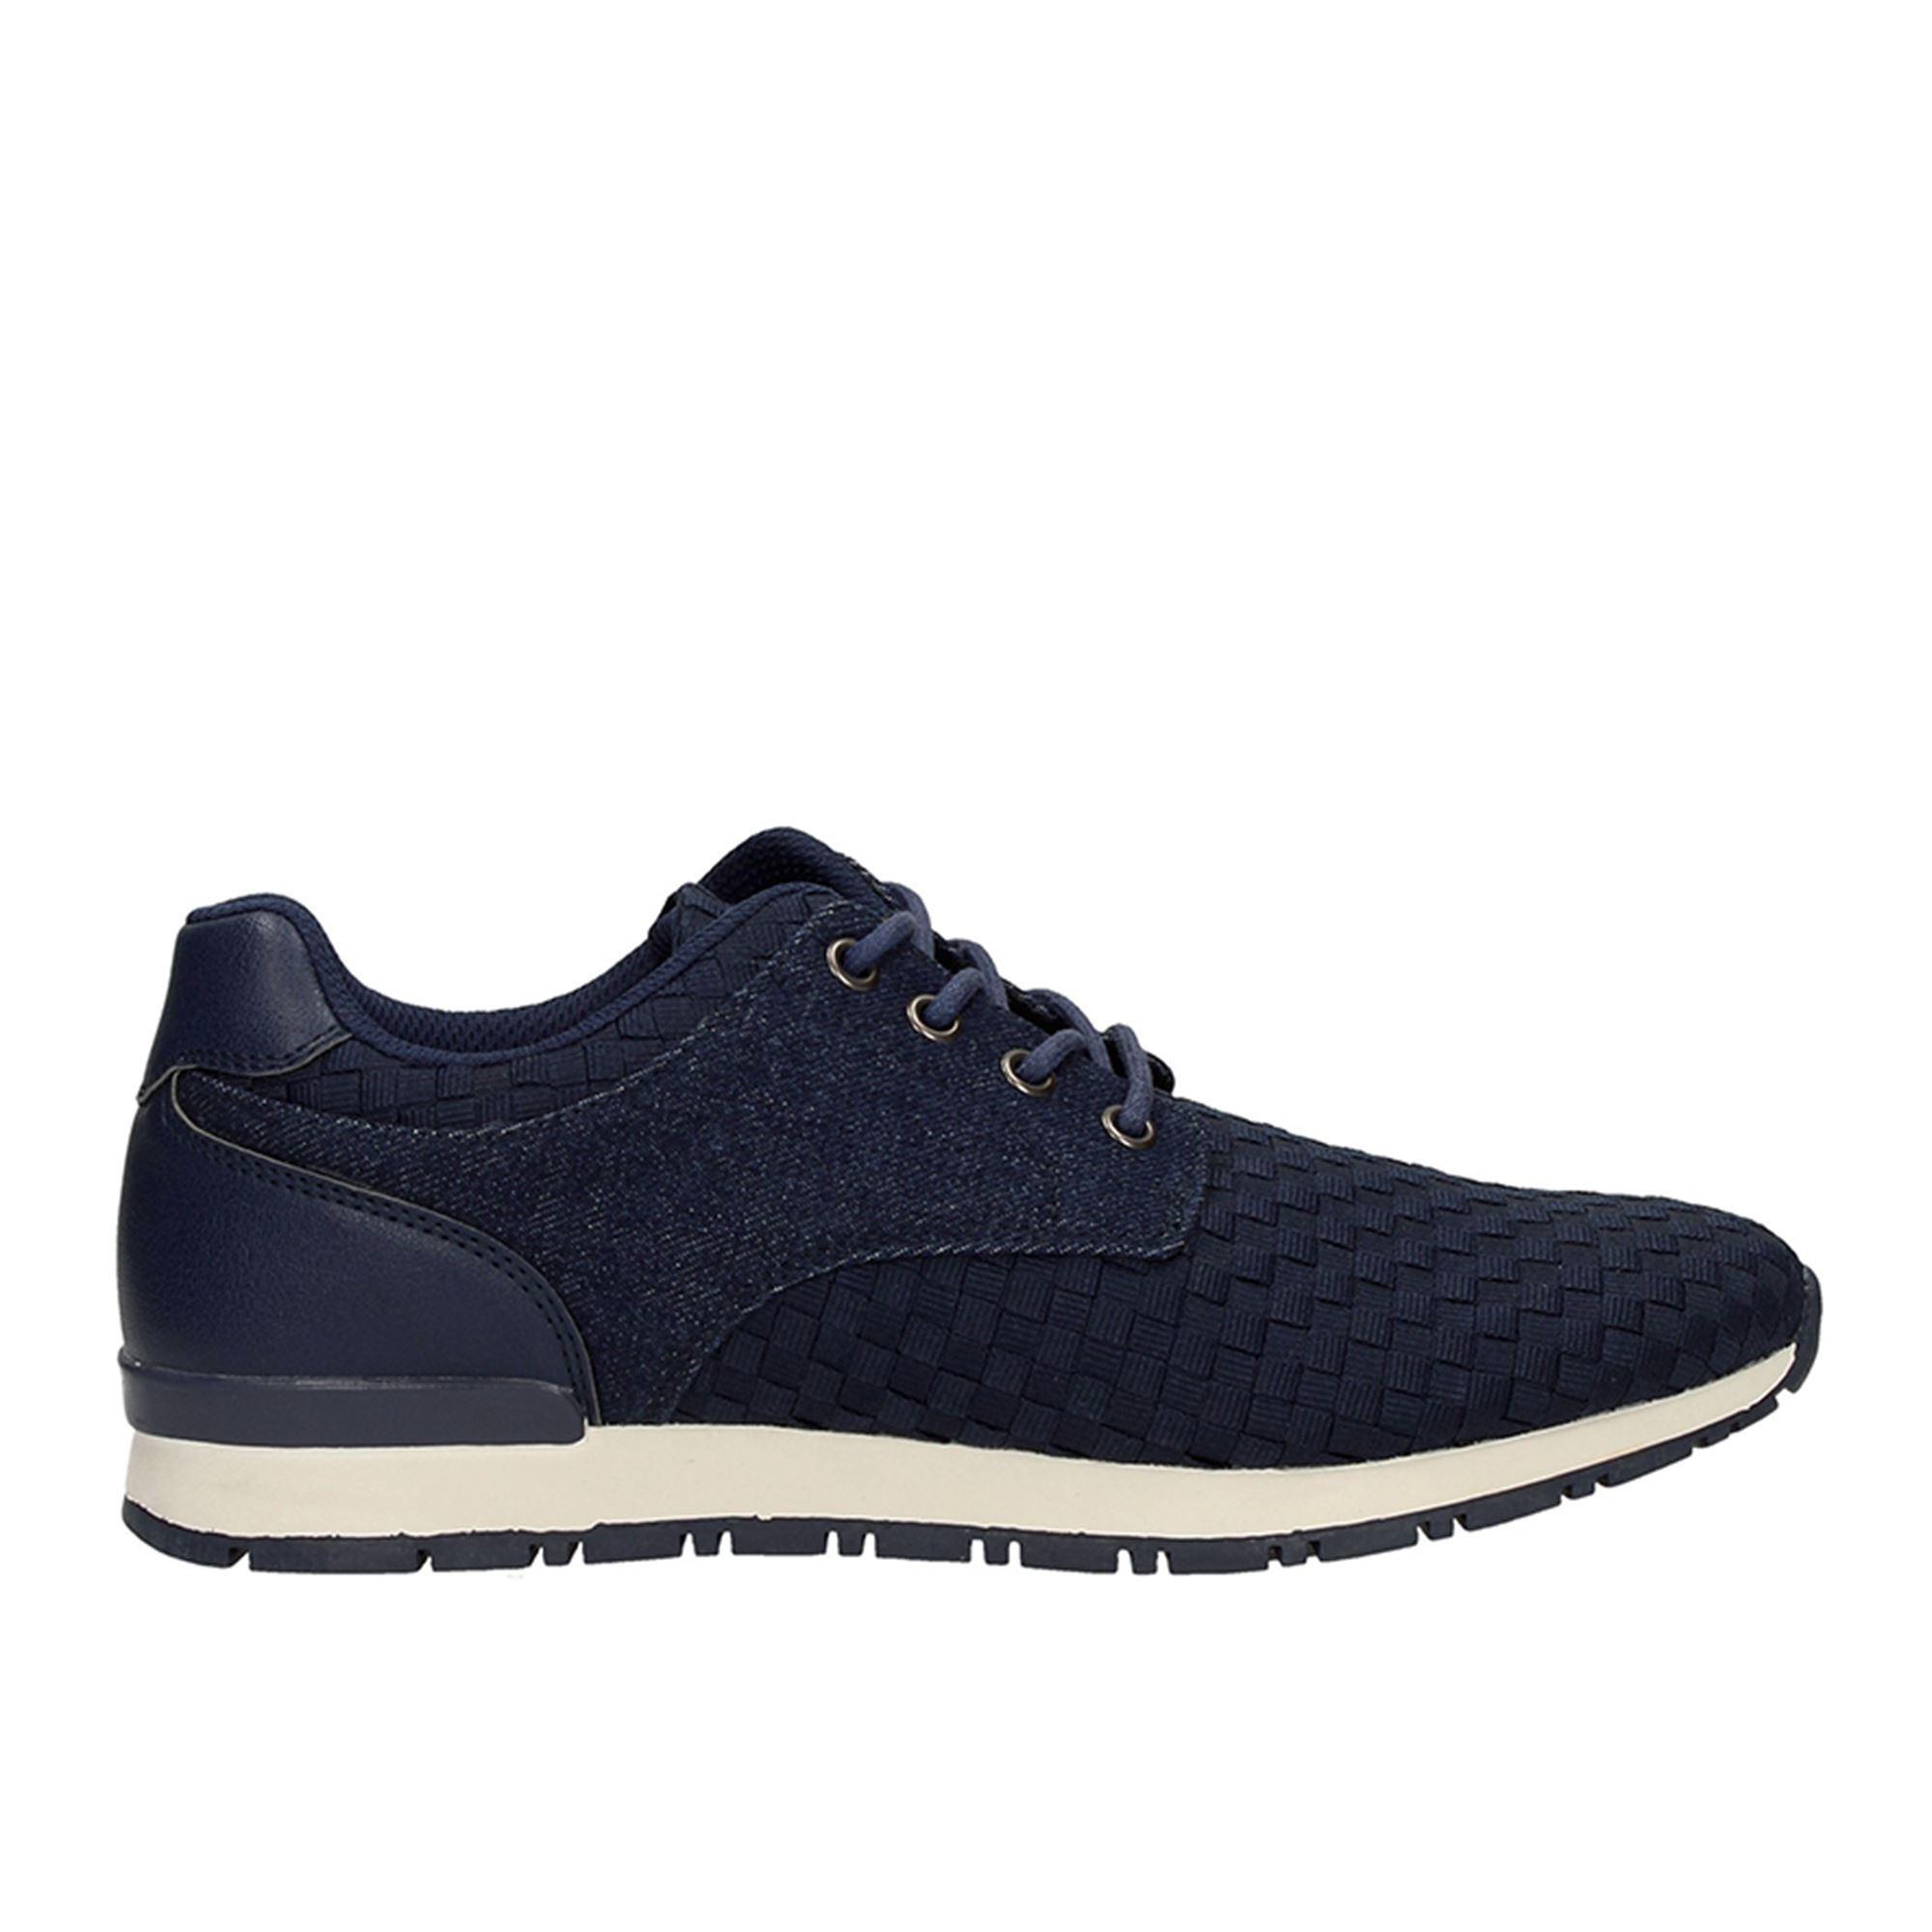 Shop Italia On Scarpe 105 Line 8435Sneakers Tata eWYED2IbH9